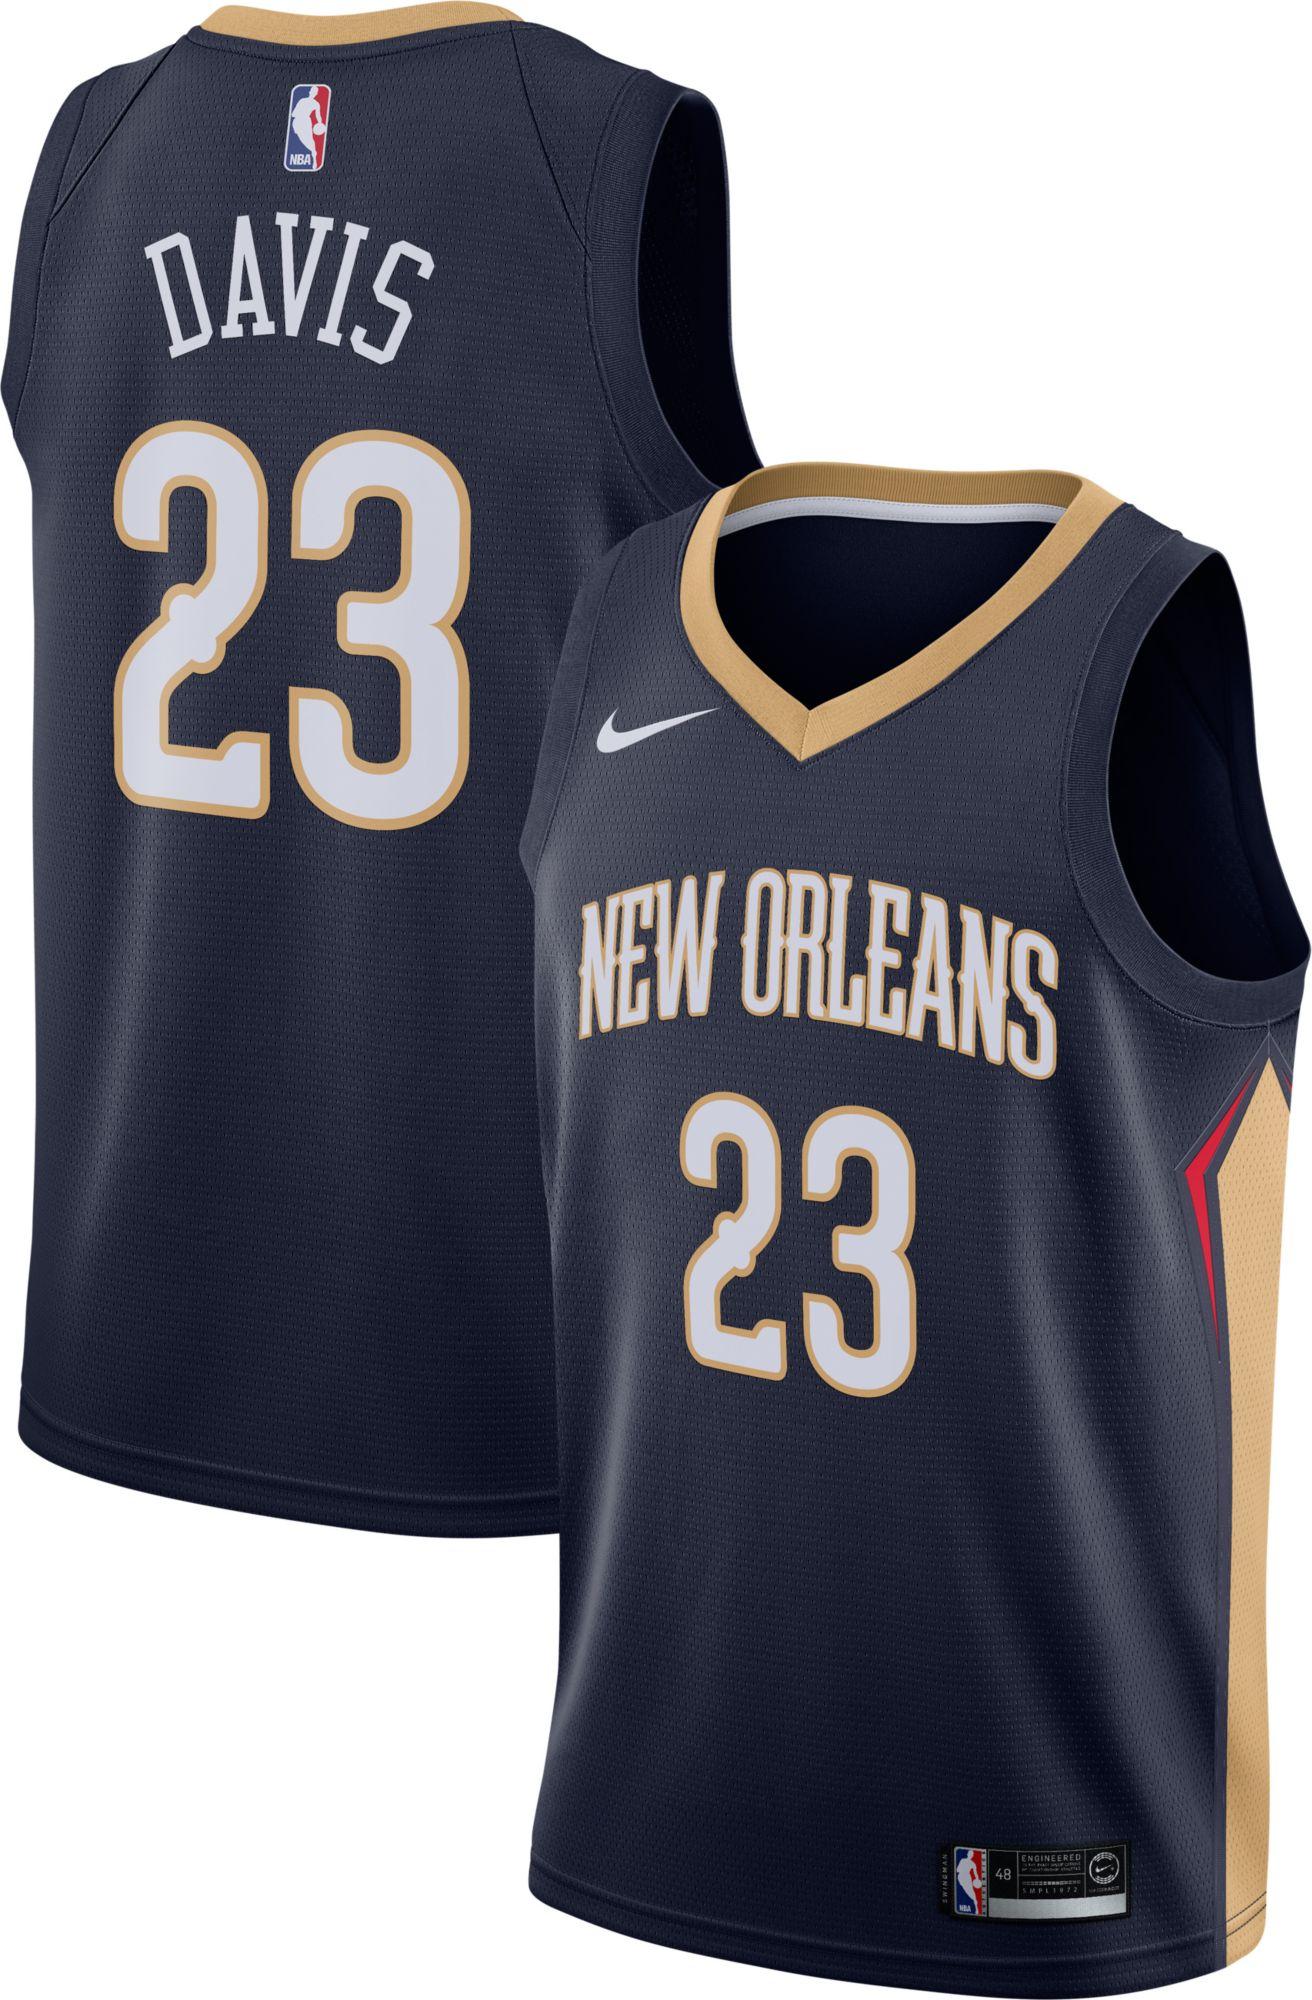 New Orleans Pelicans 23 Anthony Davis White Swingman Jersey